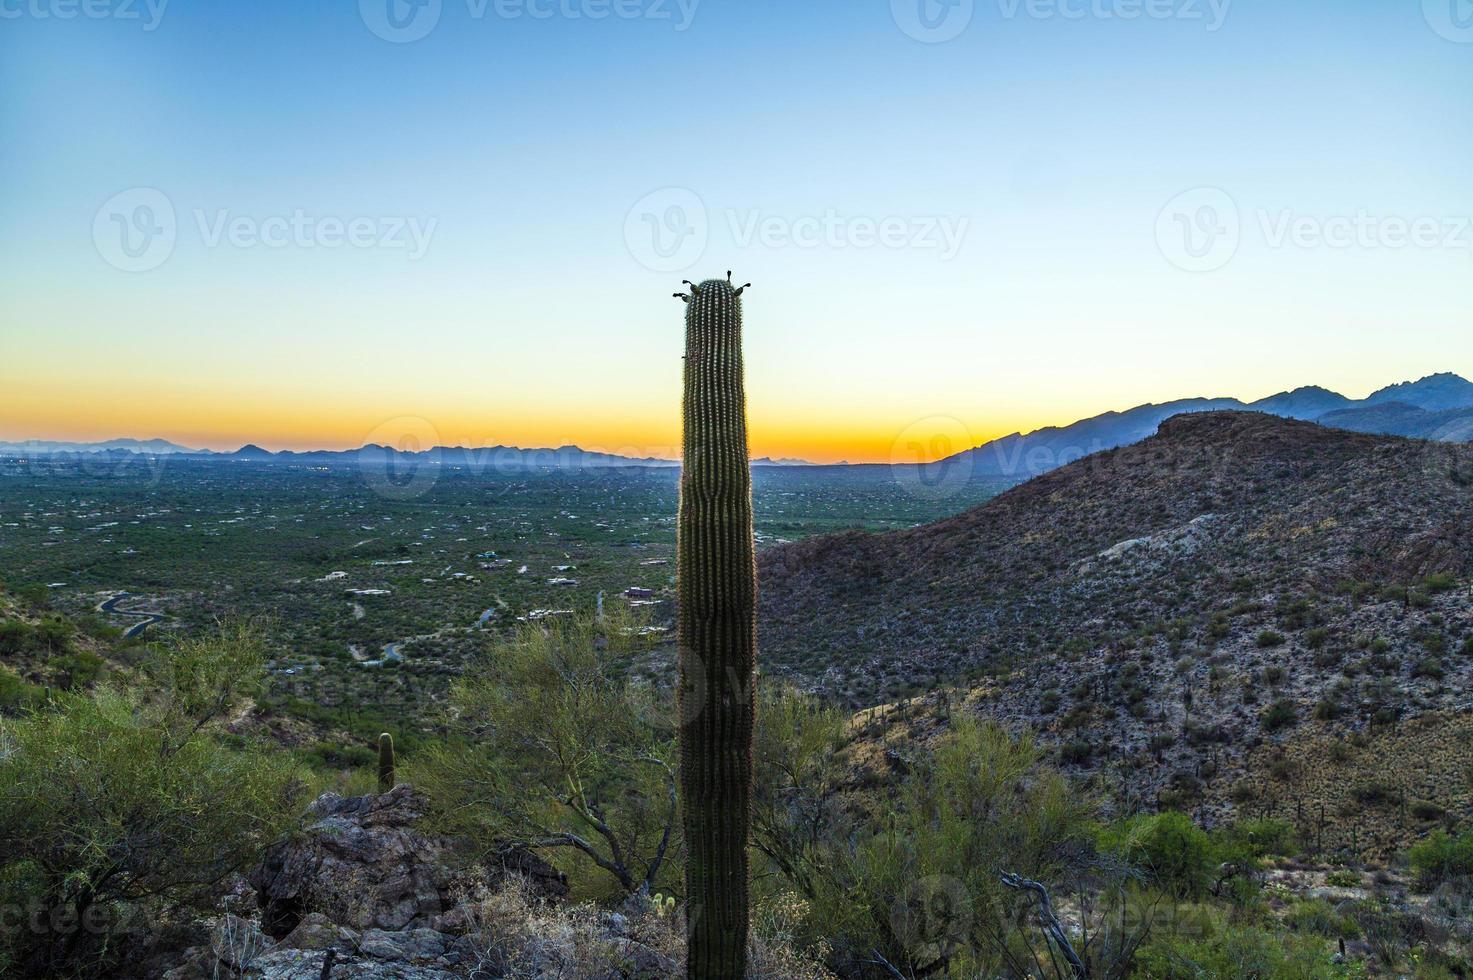 tramonto con bellissimi cactus verdi nel paesaggio foto